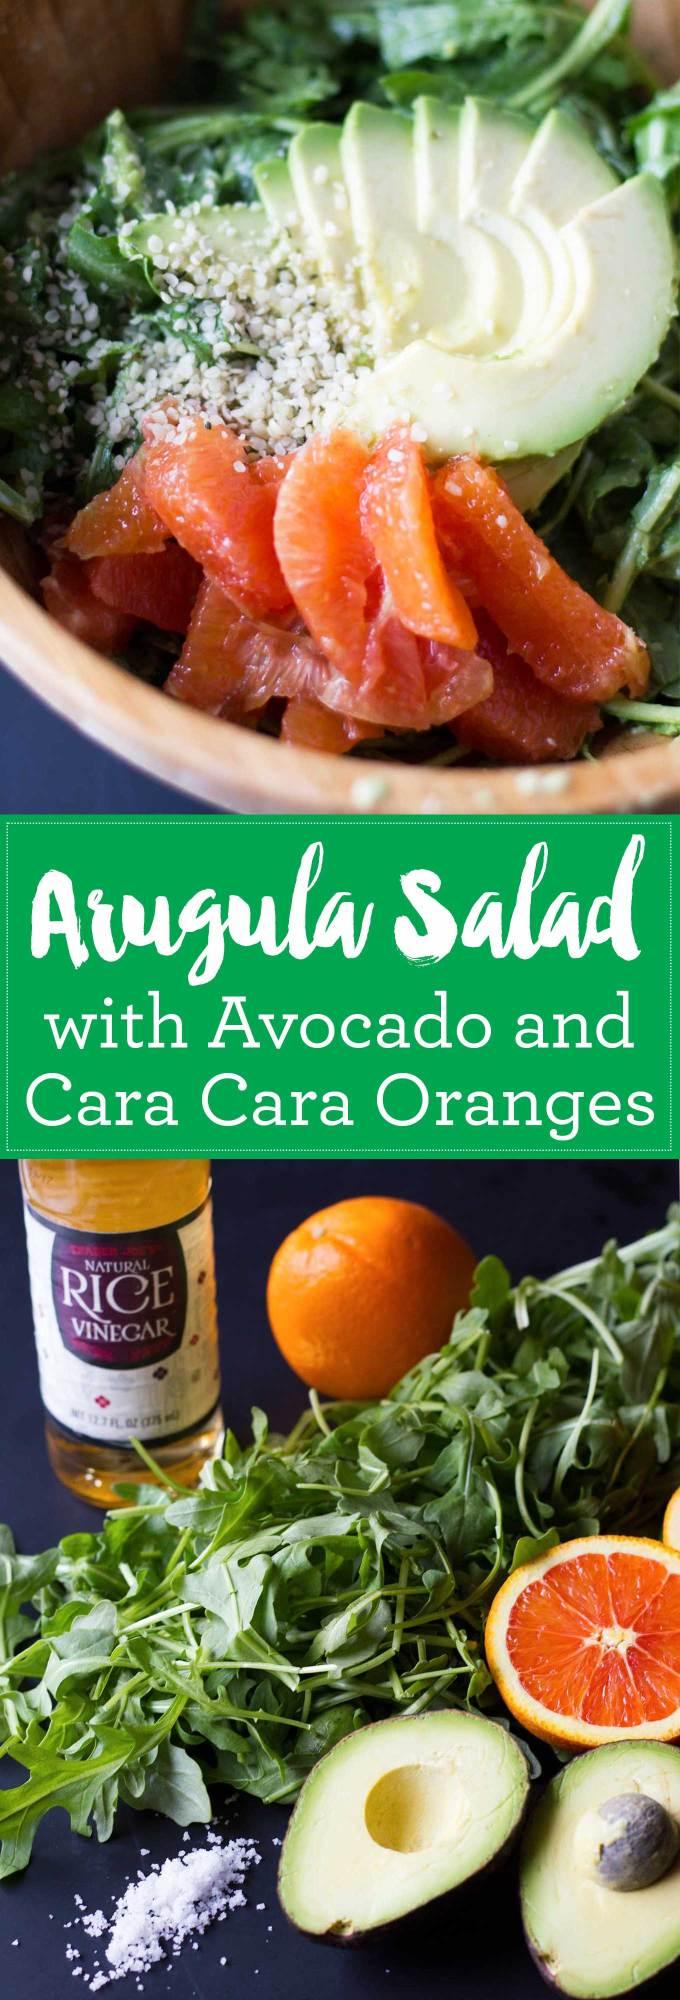 Arugula Salad with Avocado and Cara Cara Oranges - Vegan, Oil-Free, Gluten-Free| https://passtheplants.com